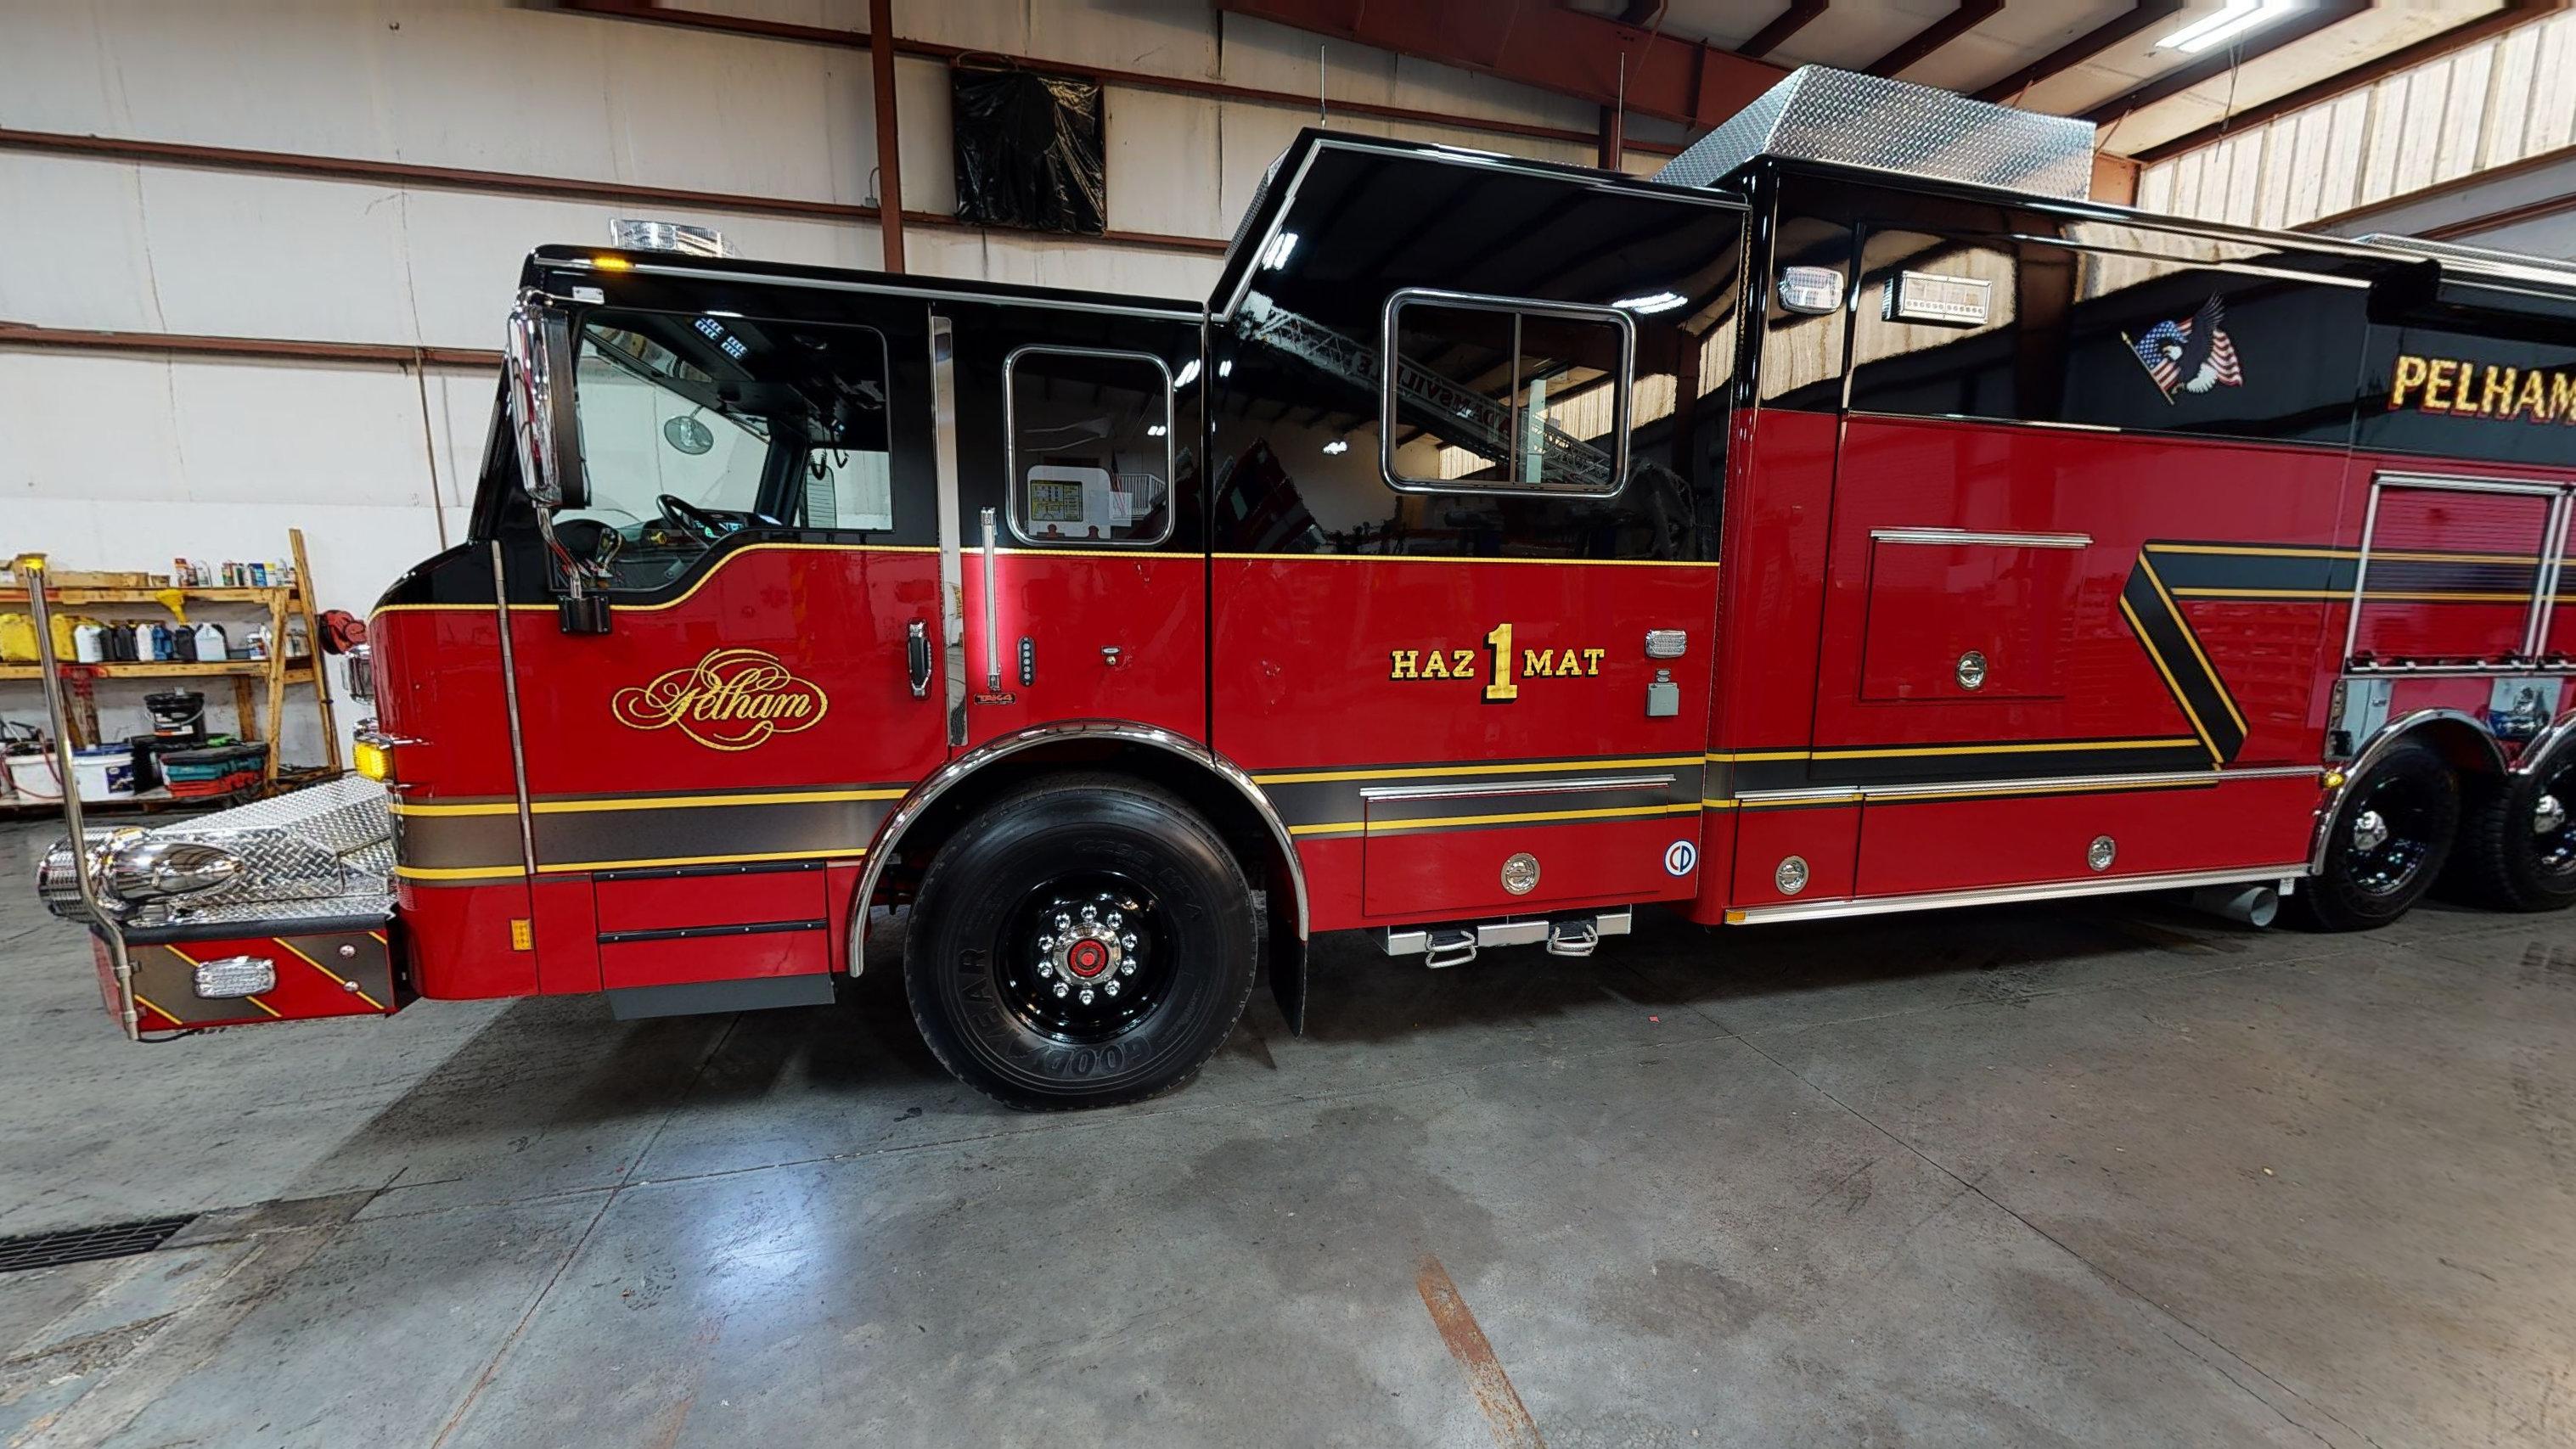 Pelham-Fire-Department-2019-Pierce-Velocity-HazmatCommand-Job-33168-12092020_072213